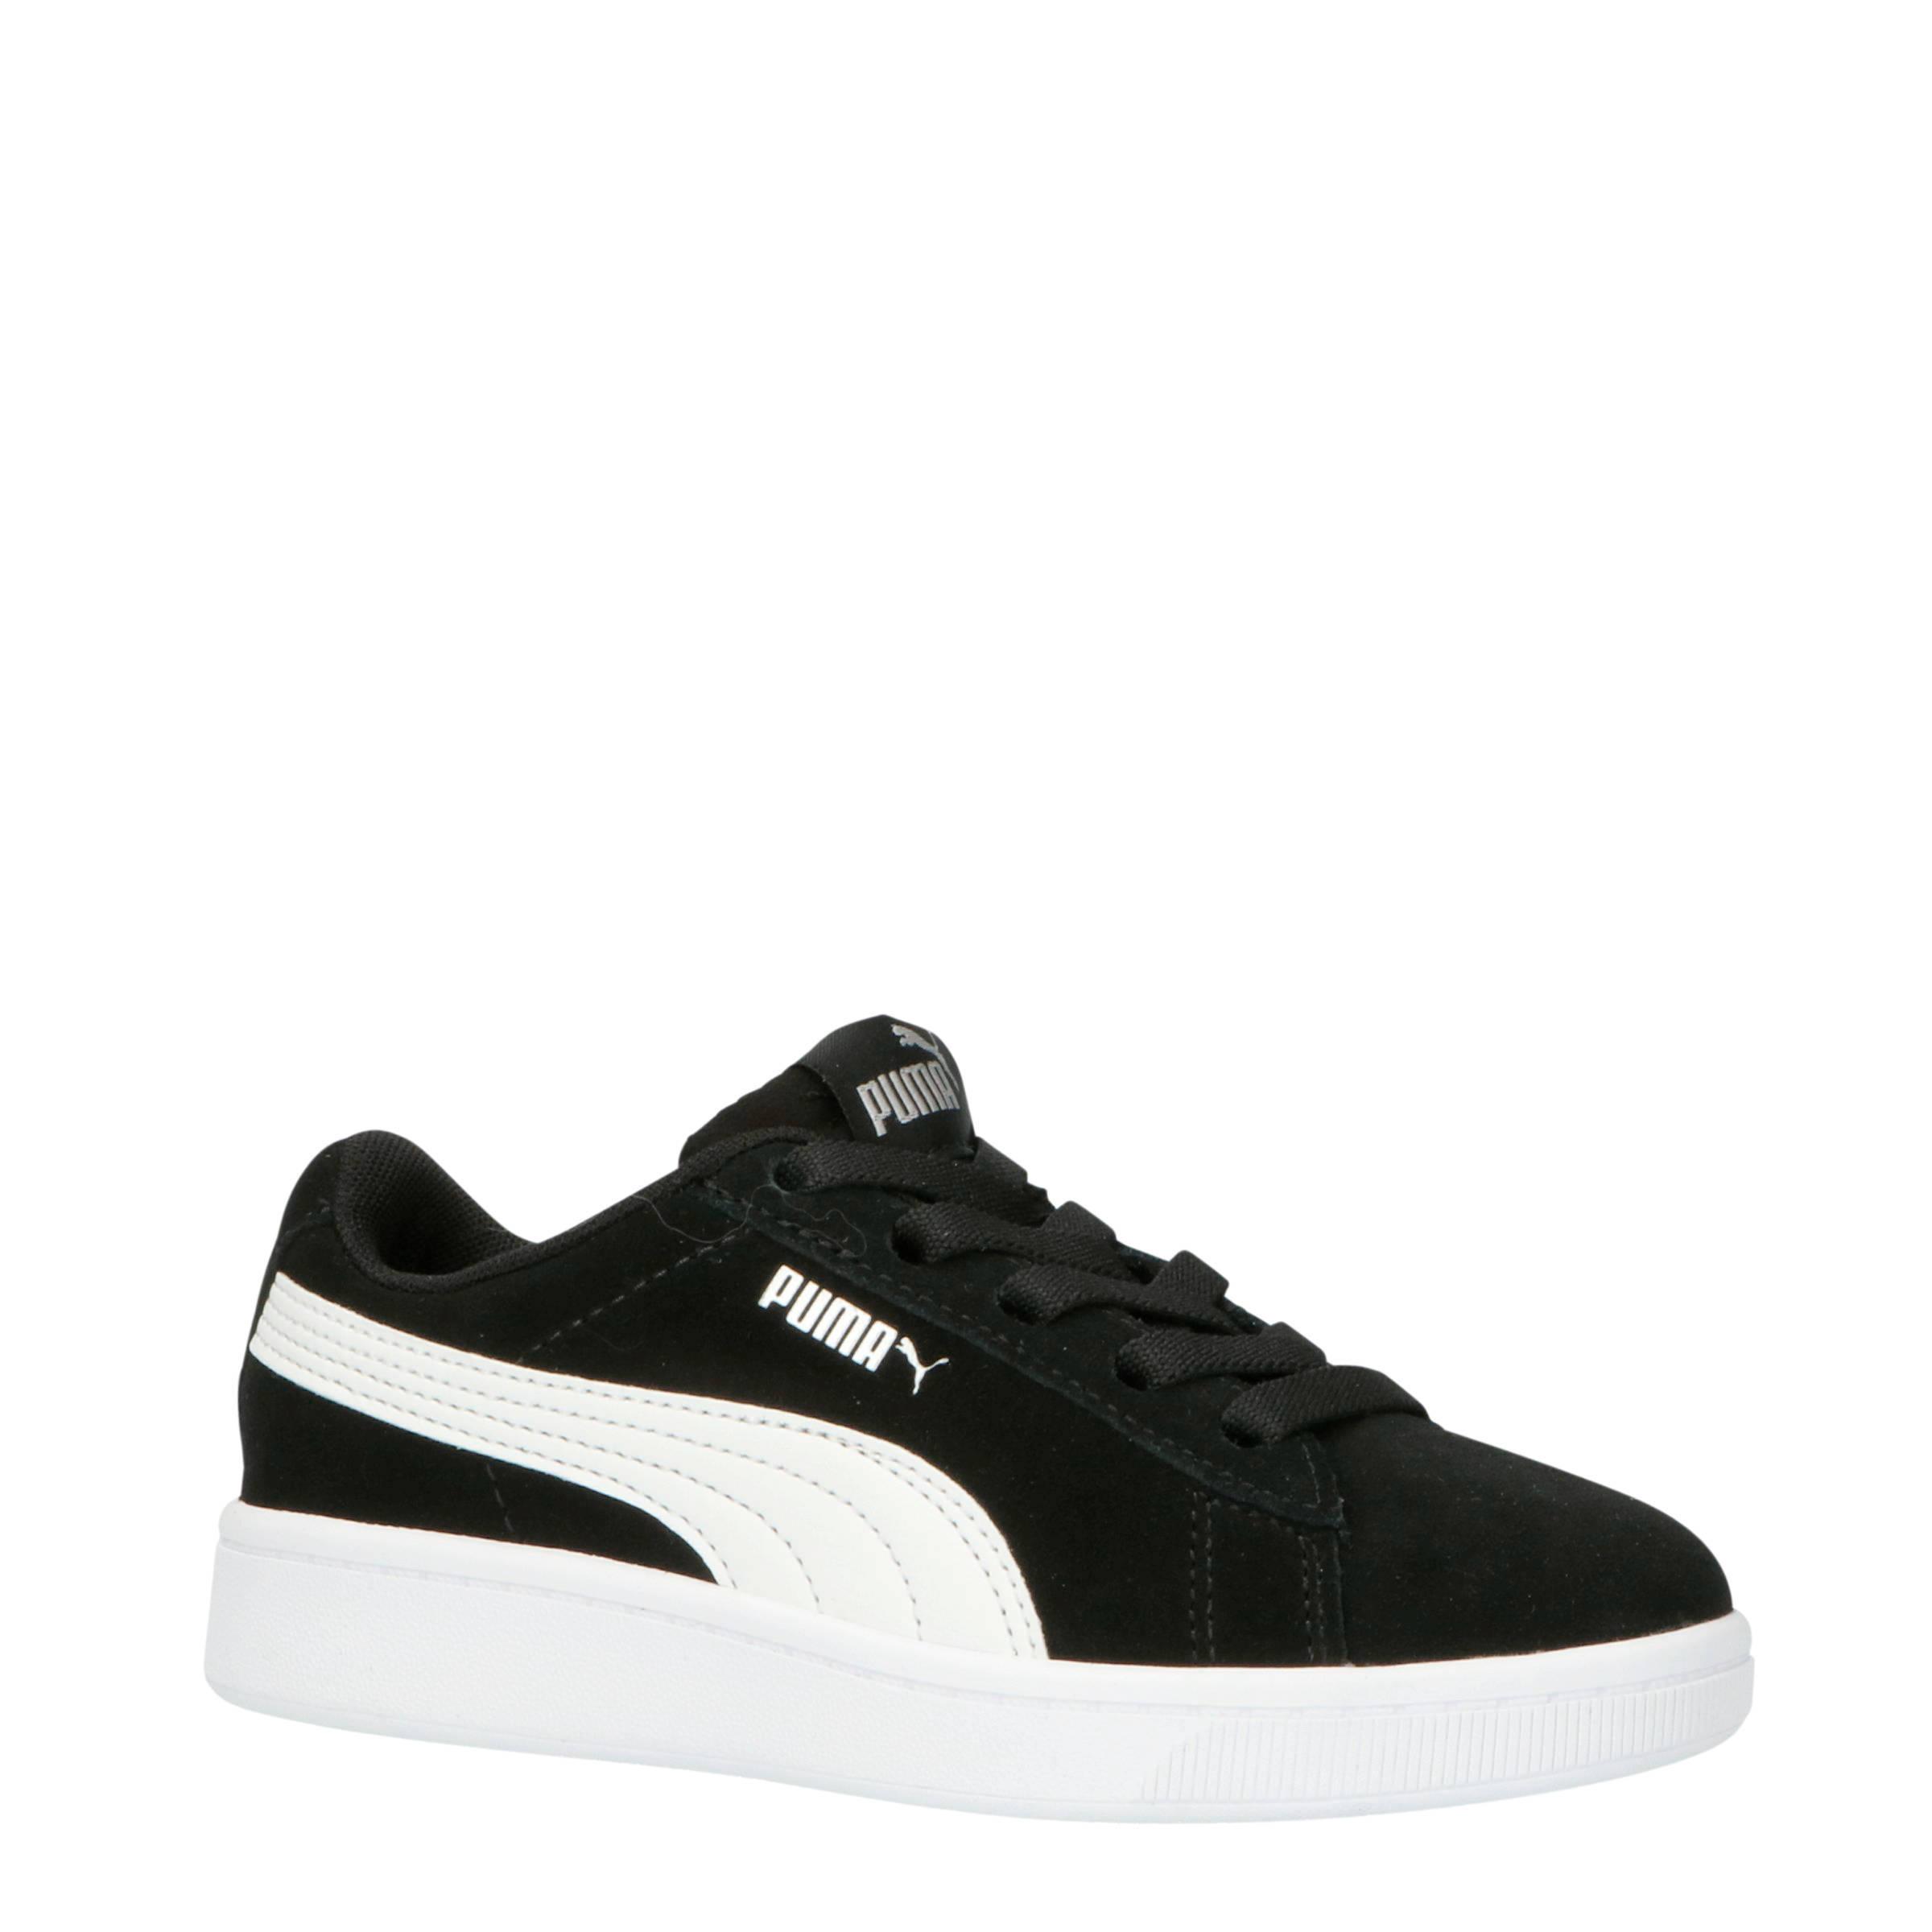 Puma kindersneakers kopen - Vind jouw Puma kindersneakers ...